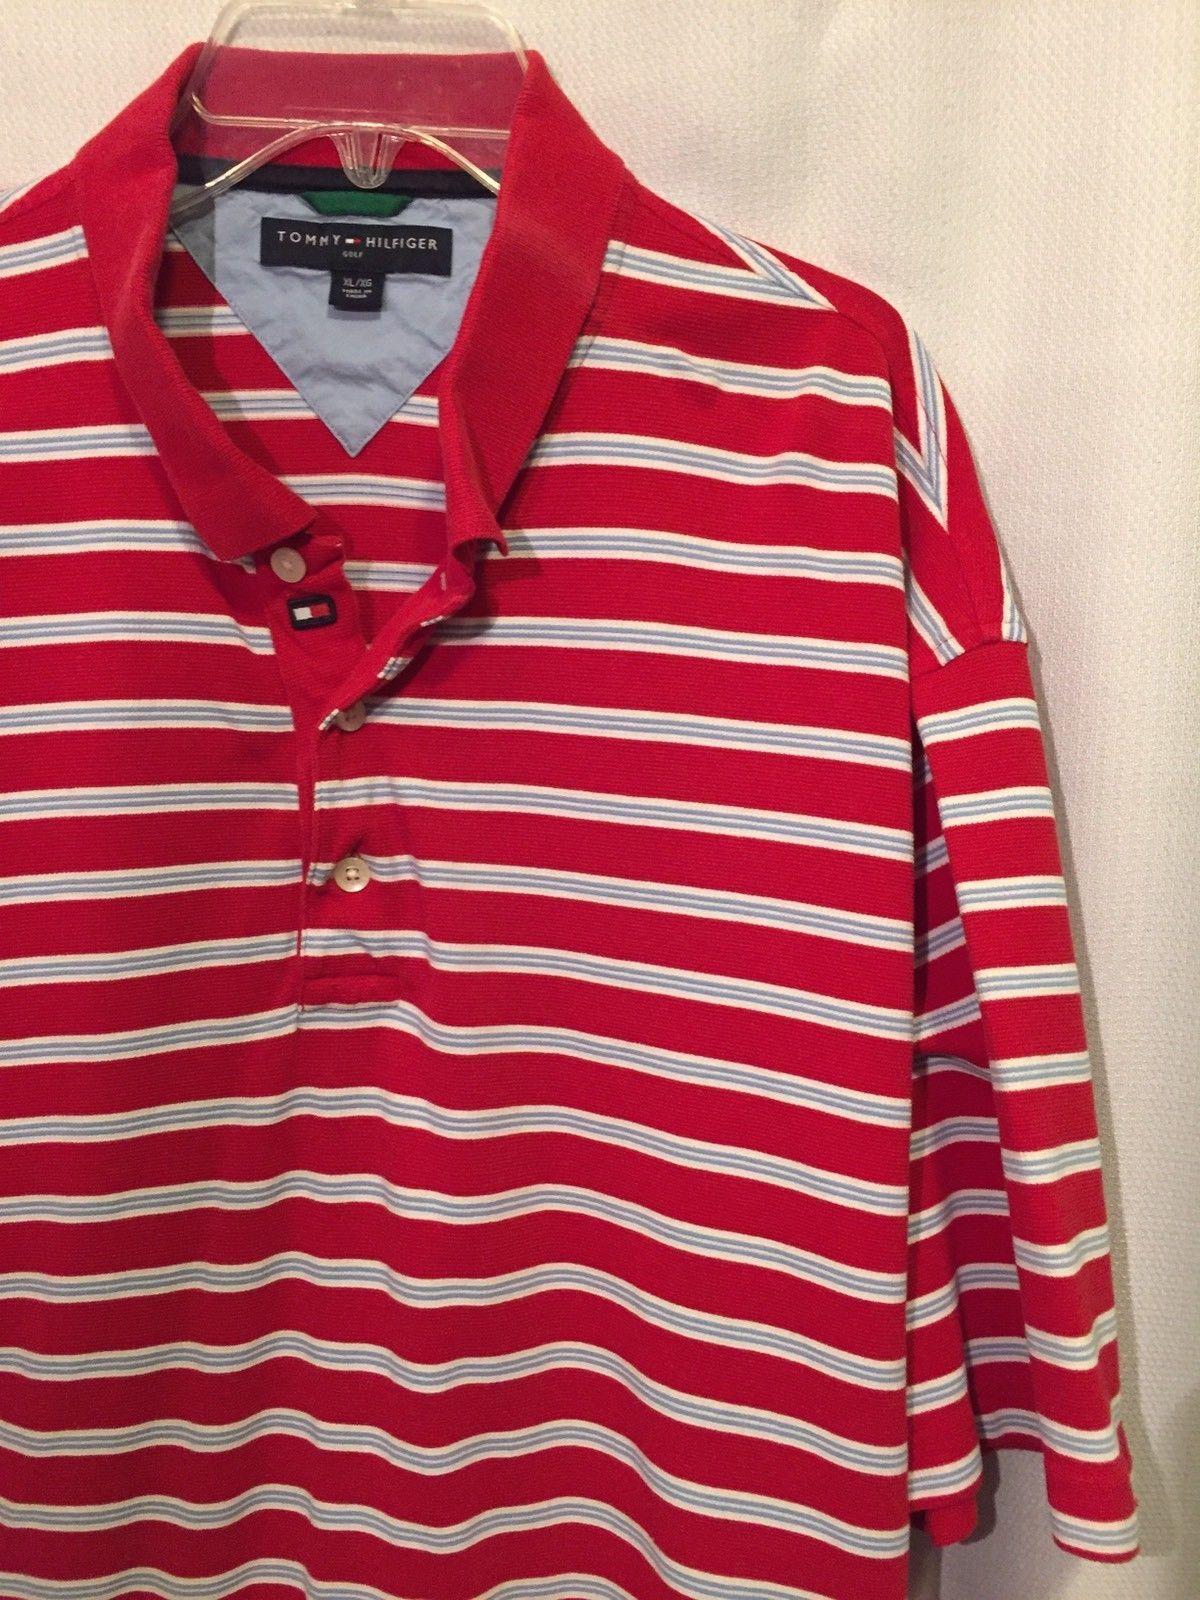 f040c40343e1 S l1600. S l1600. Previous. Tommy Hilfiger Golf Polo Shirt Size XL Red White  Blue striped Logo Collar Cotton